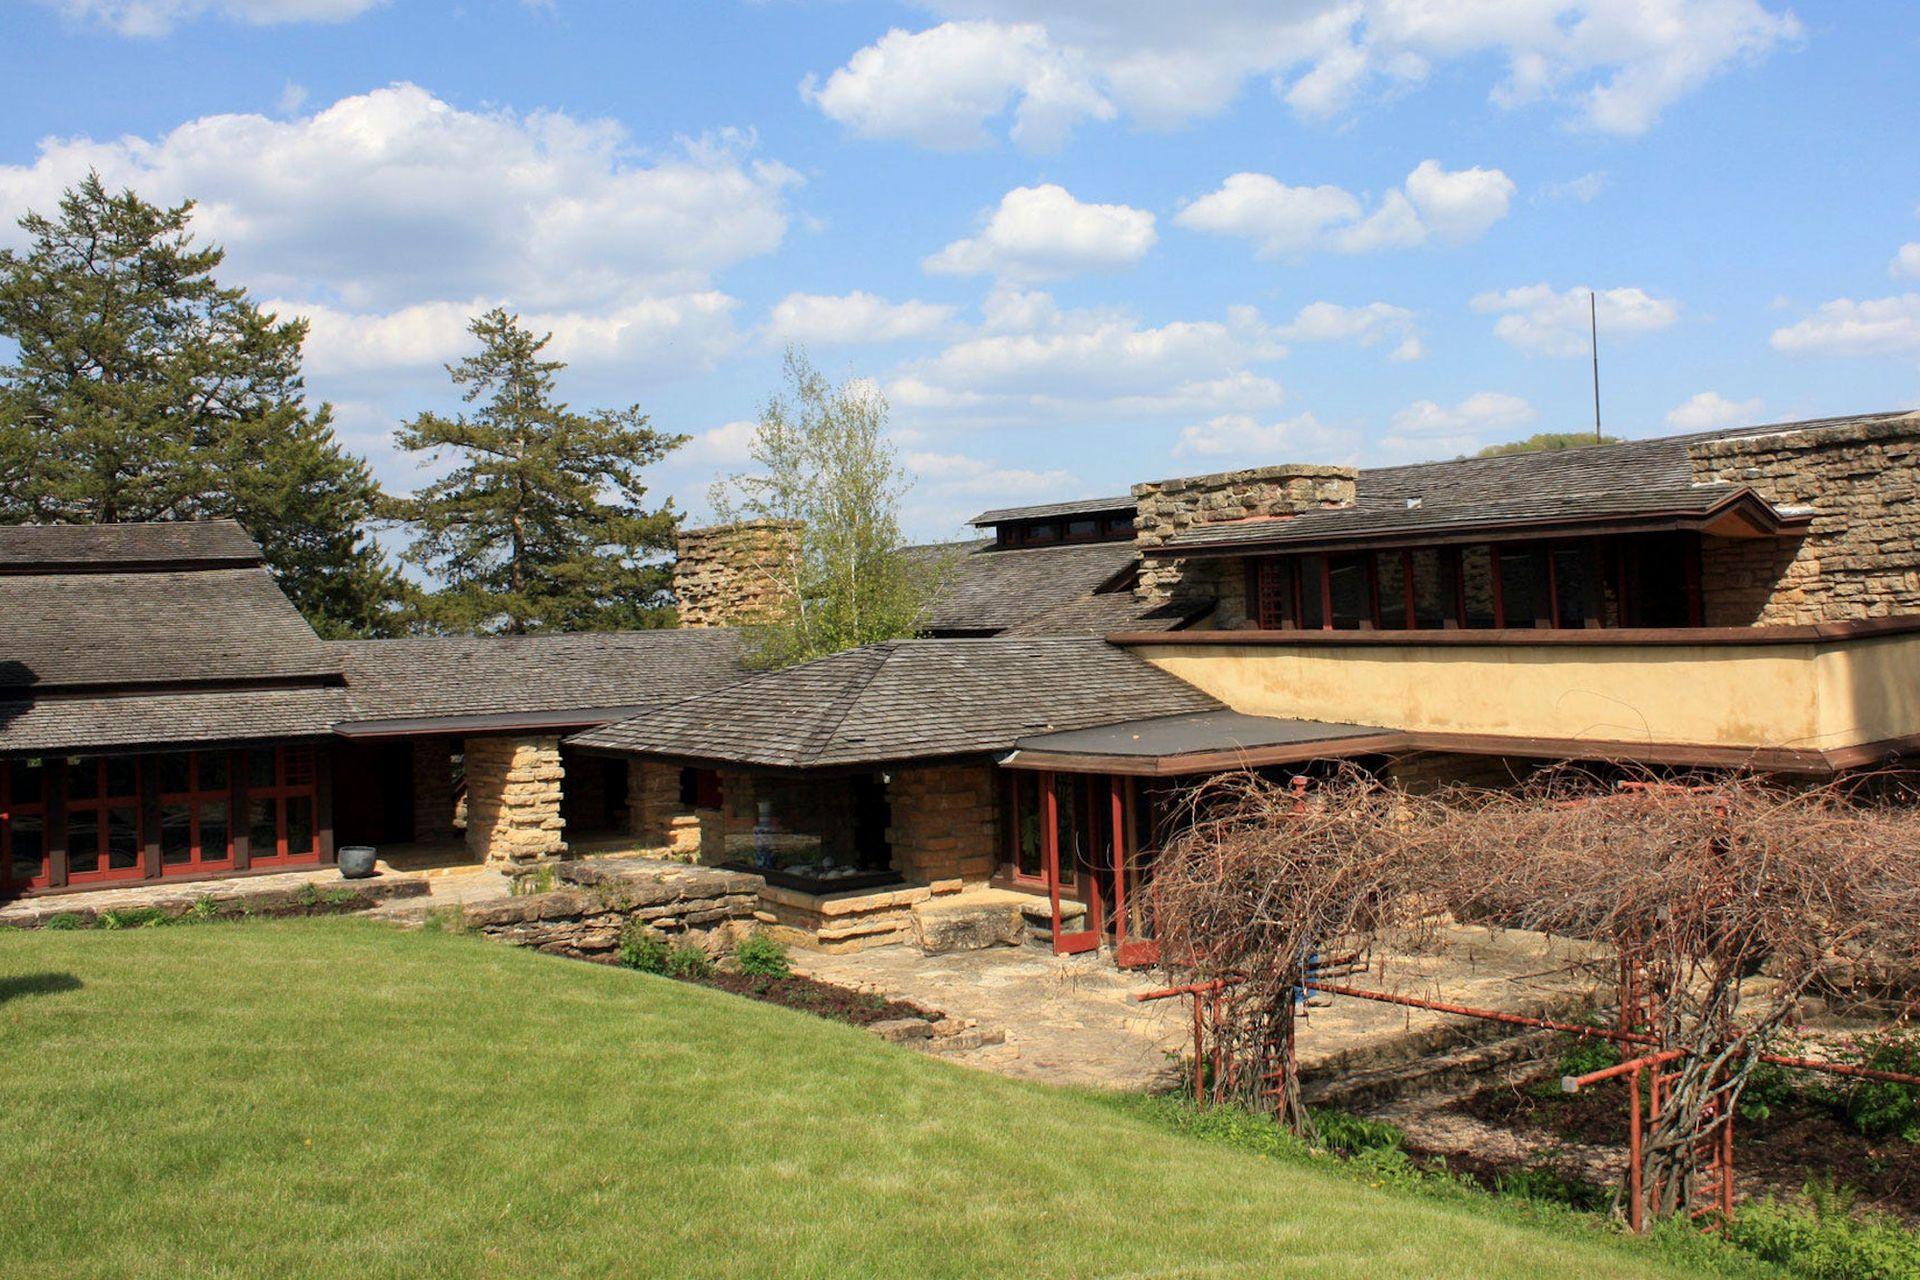 Taliesin fue construida con el modelo de arquitectura orgánica